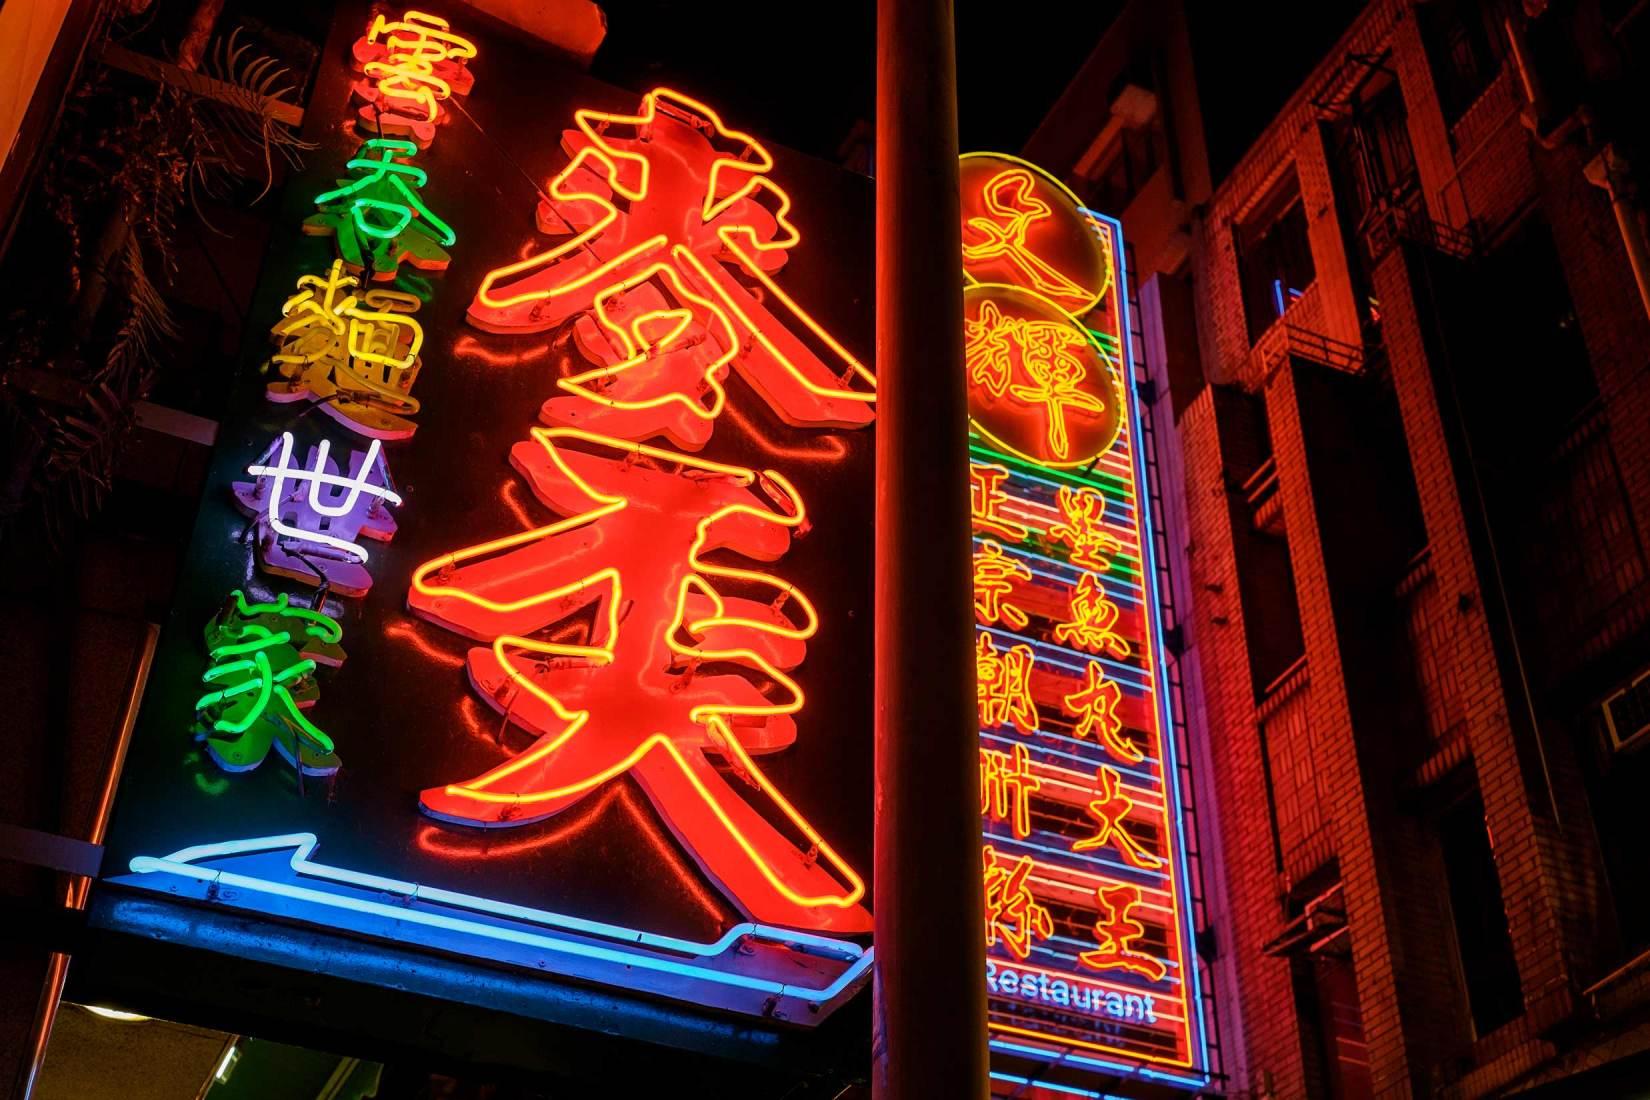 PWS020-0271-Sharon-Blance-Melbourne-photographer-Hong-Kong-neon